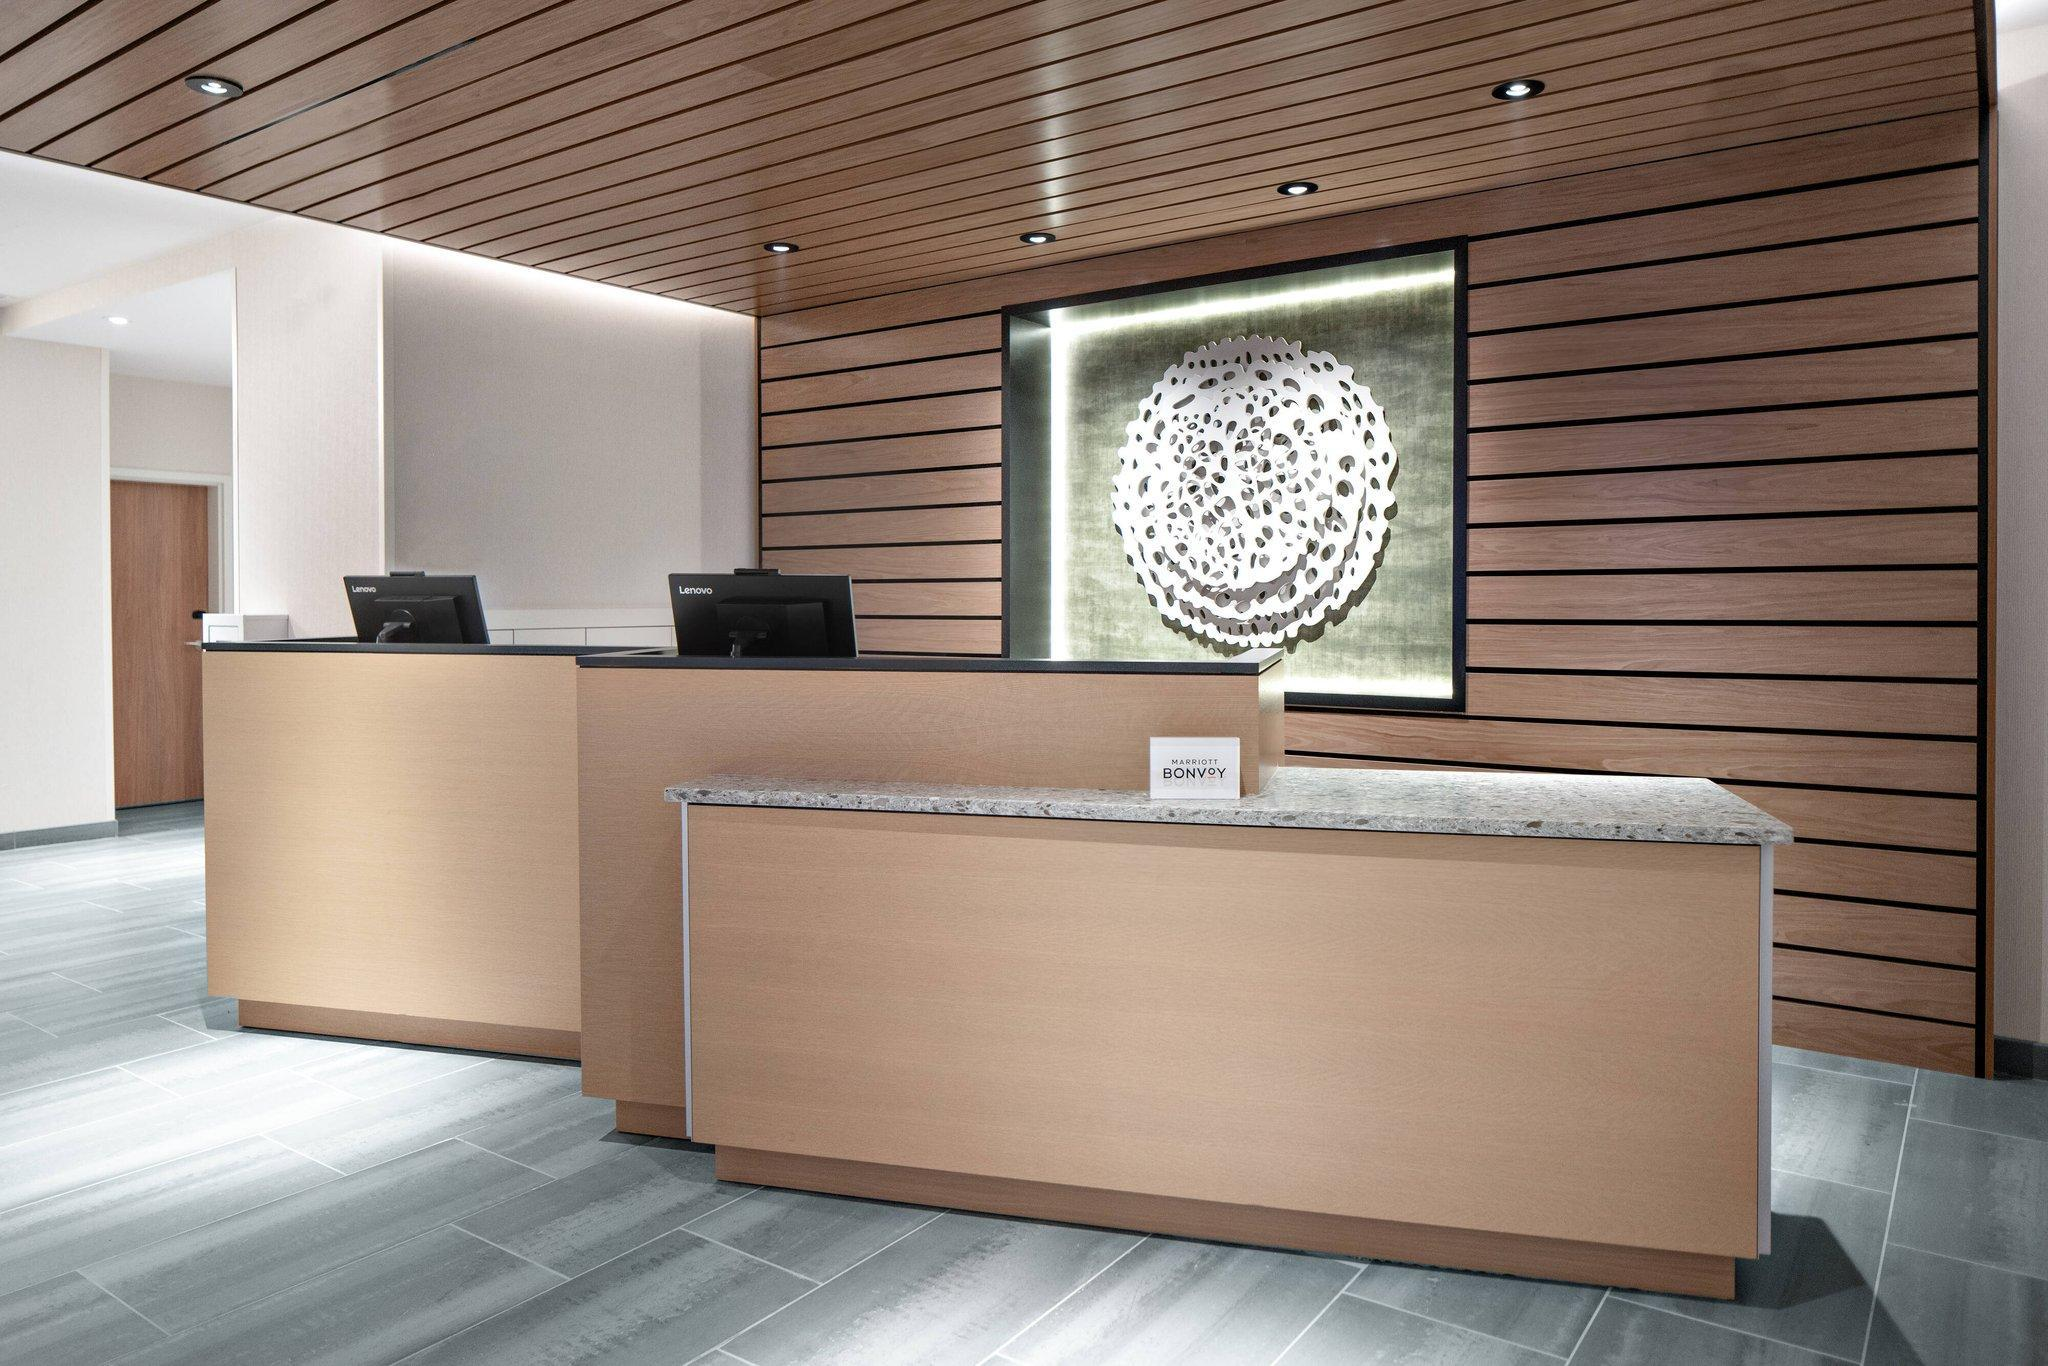 Fairfield Inn & Suites By Marriott Lake Geneva